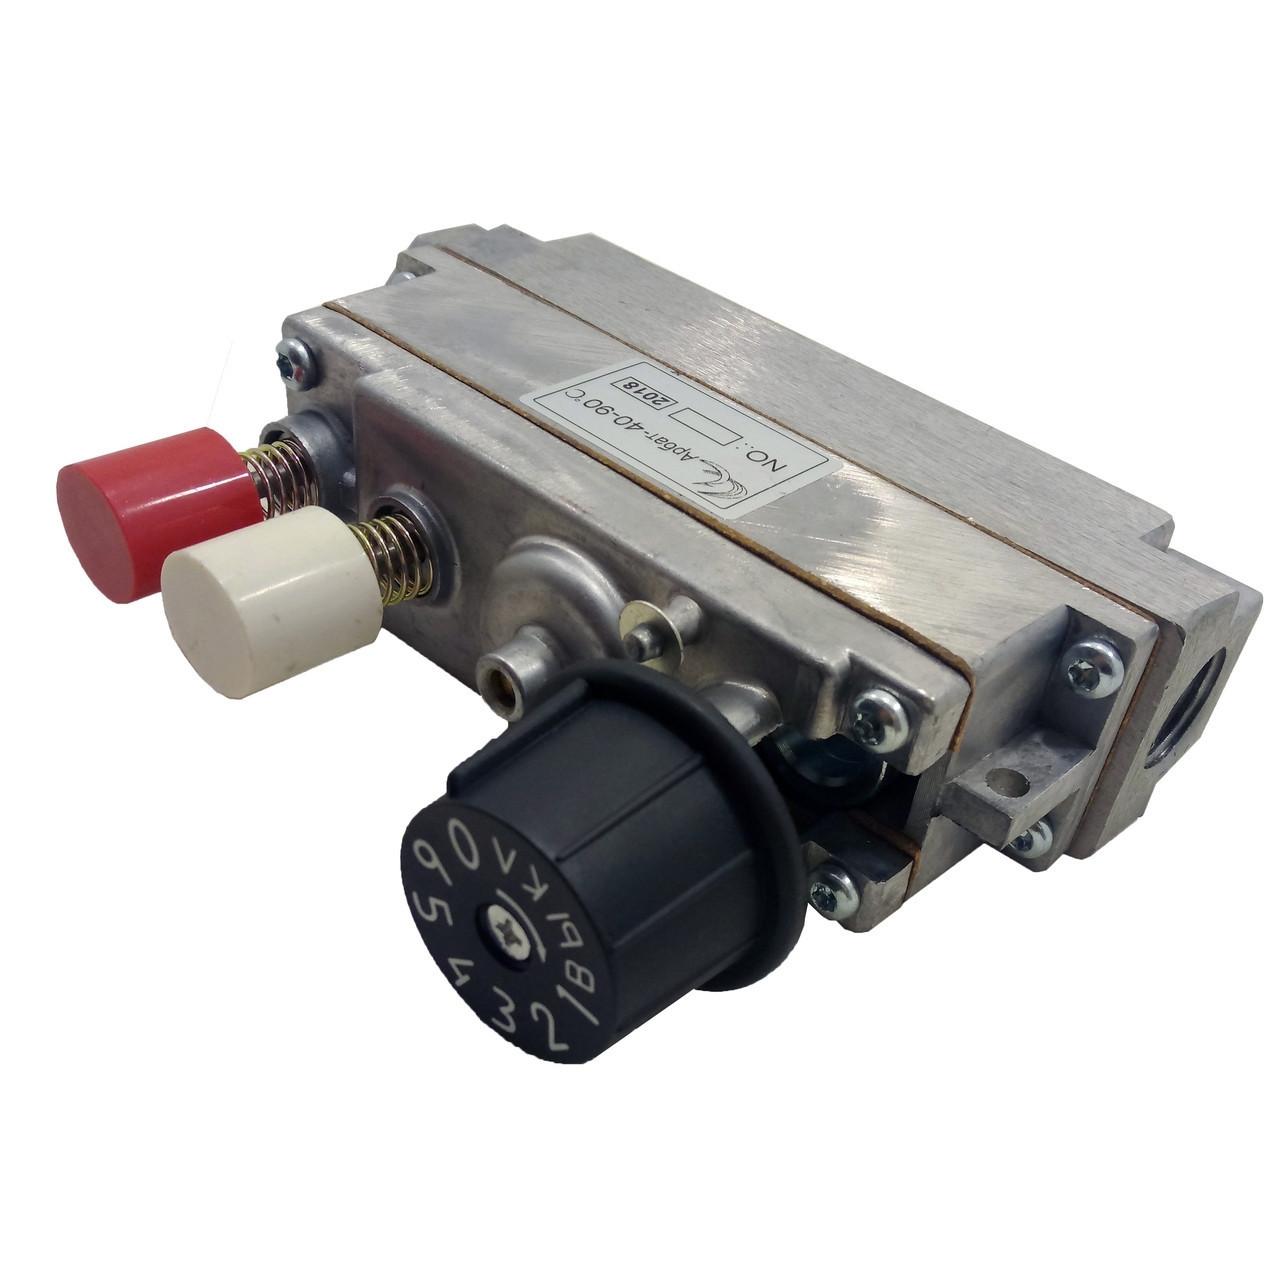 Газовая автоматика Арбат, Арбат-1, Арбат-11 (с сухим сильфоном)